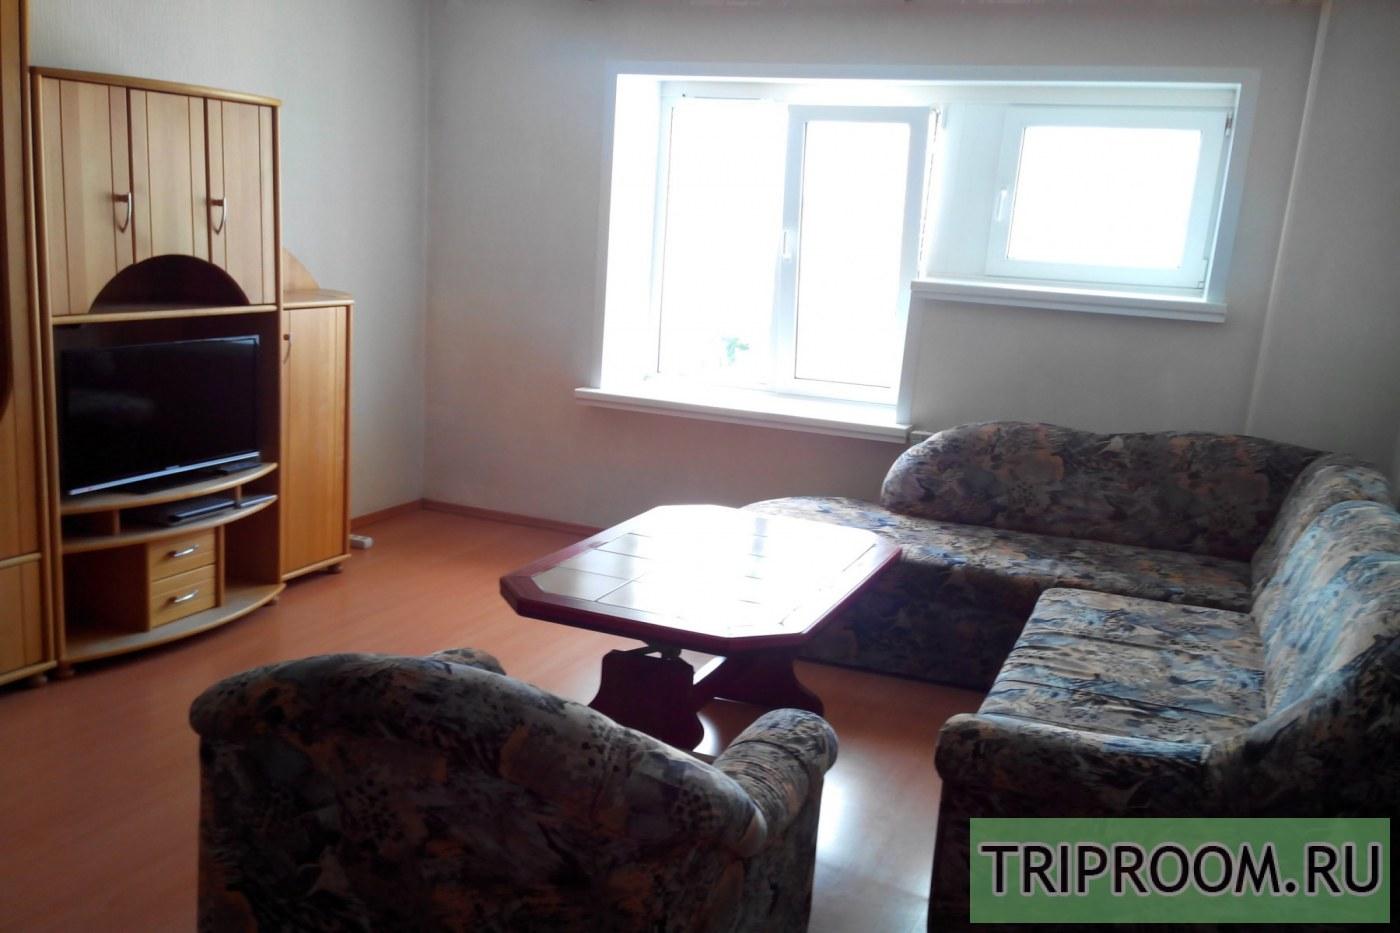 3-комнатная квартира посуточно (вариант № 40613), ул. Фрунзе улица, фото № 1